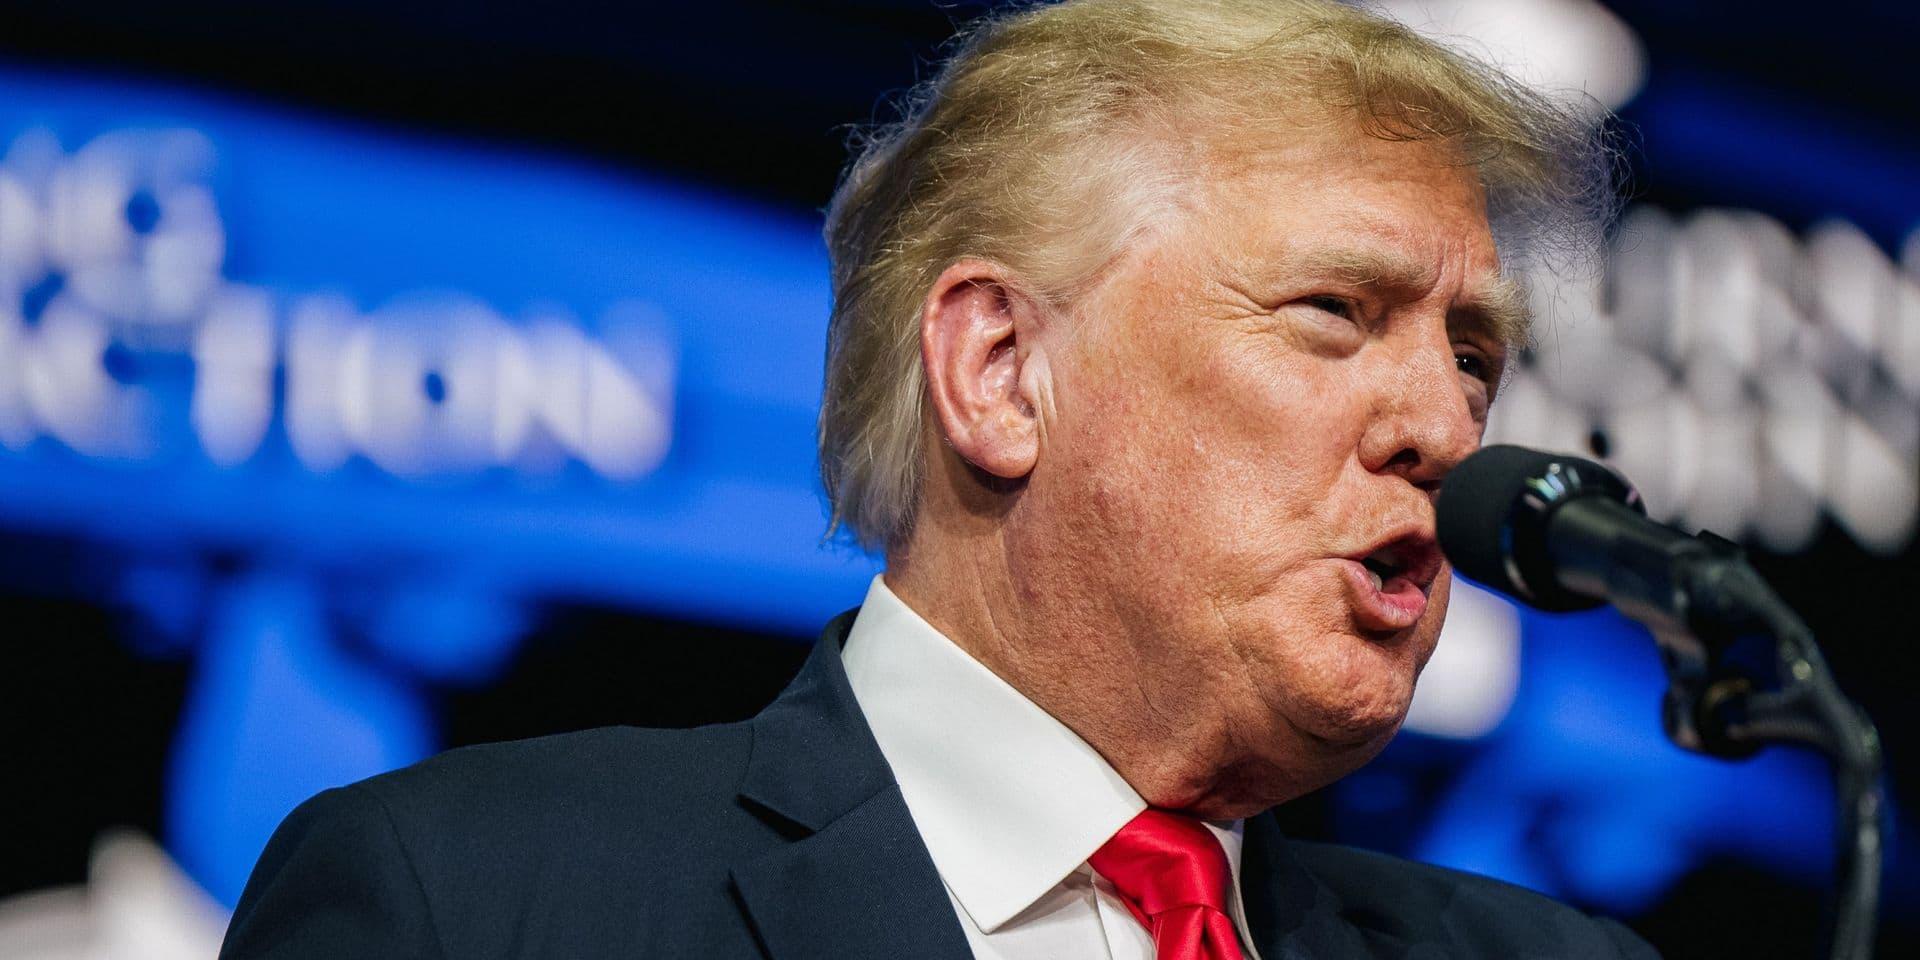 Alors que les USA s'inquiètent du variant Delta, Donald Trump remet en question certaines recommandations